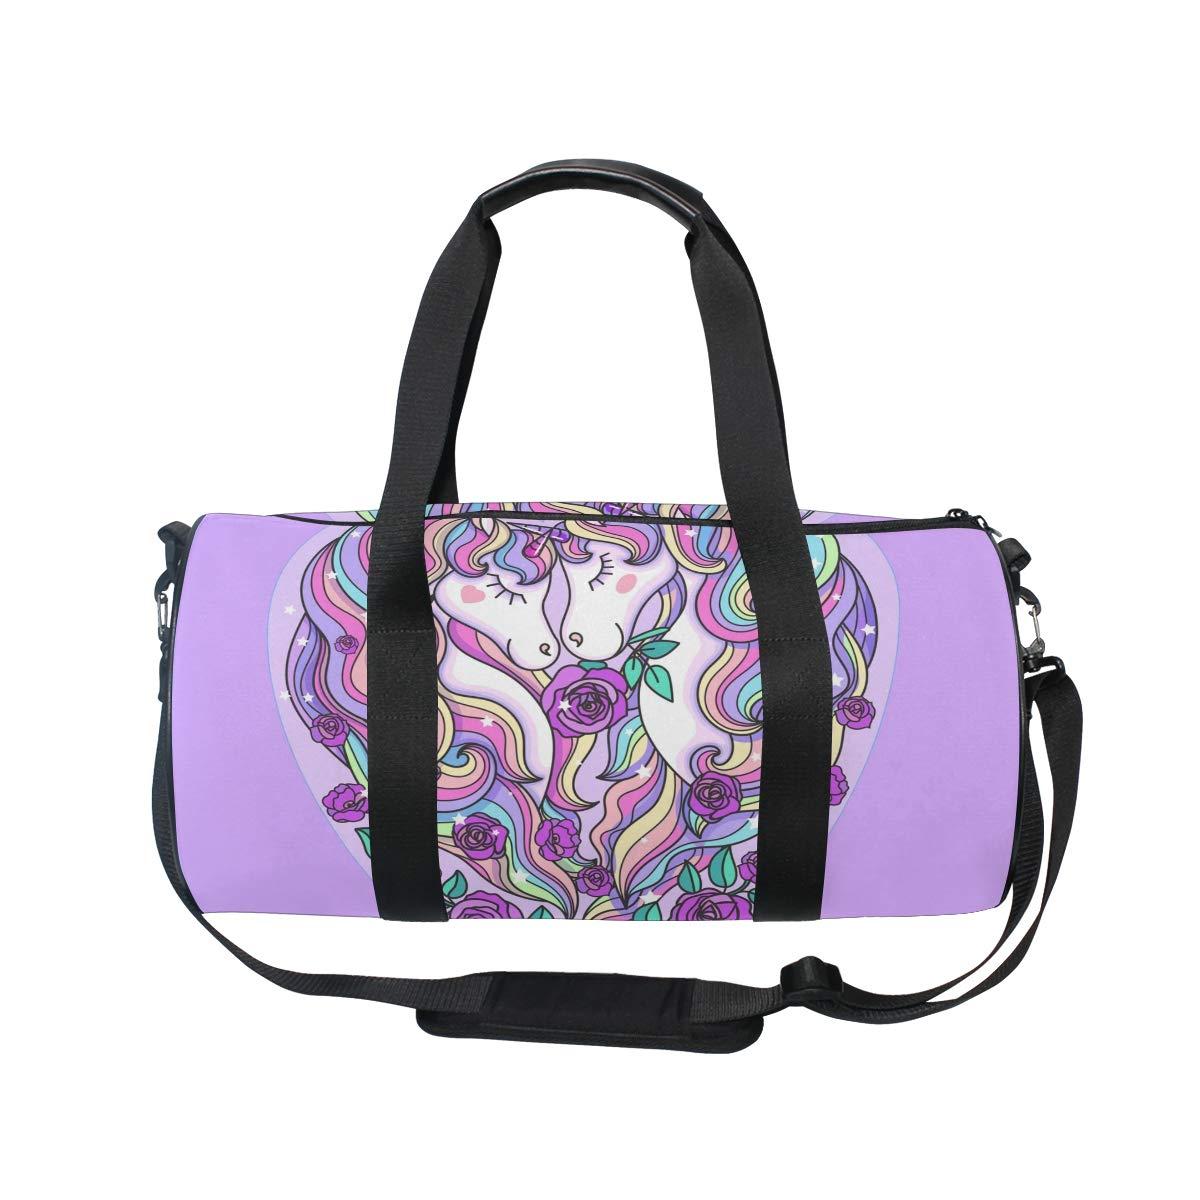 WIHVE Gym Duffel Bag Unicorns Mane Roses Heart Love Sports Lightweight Canvas Travel Luggage Bag